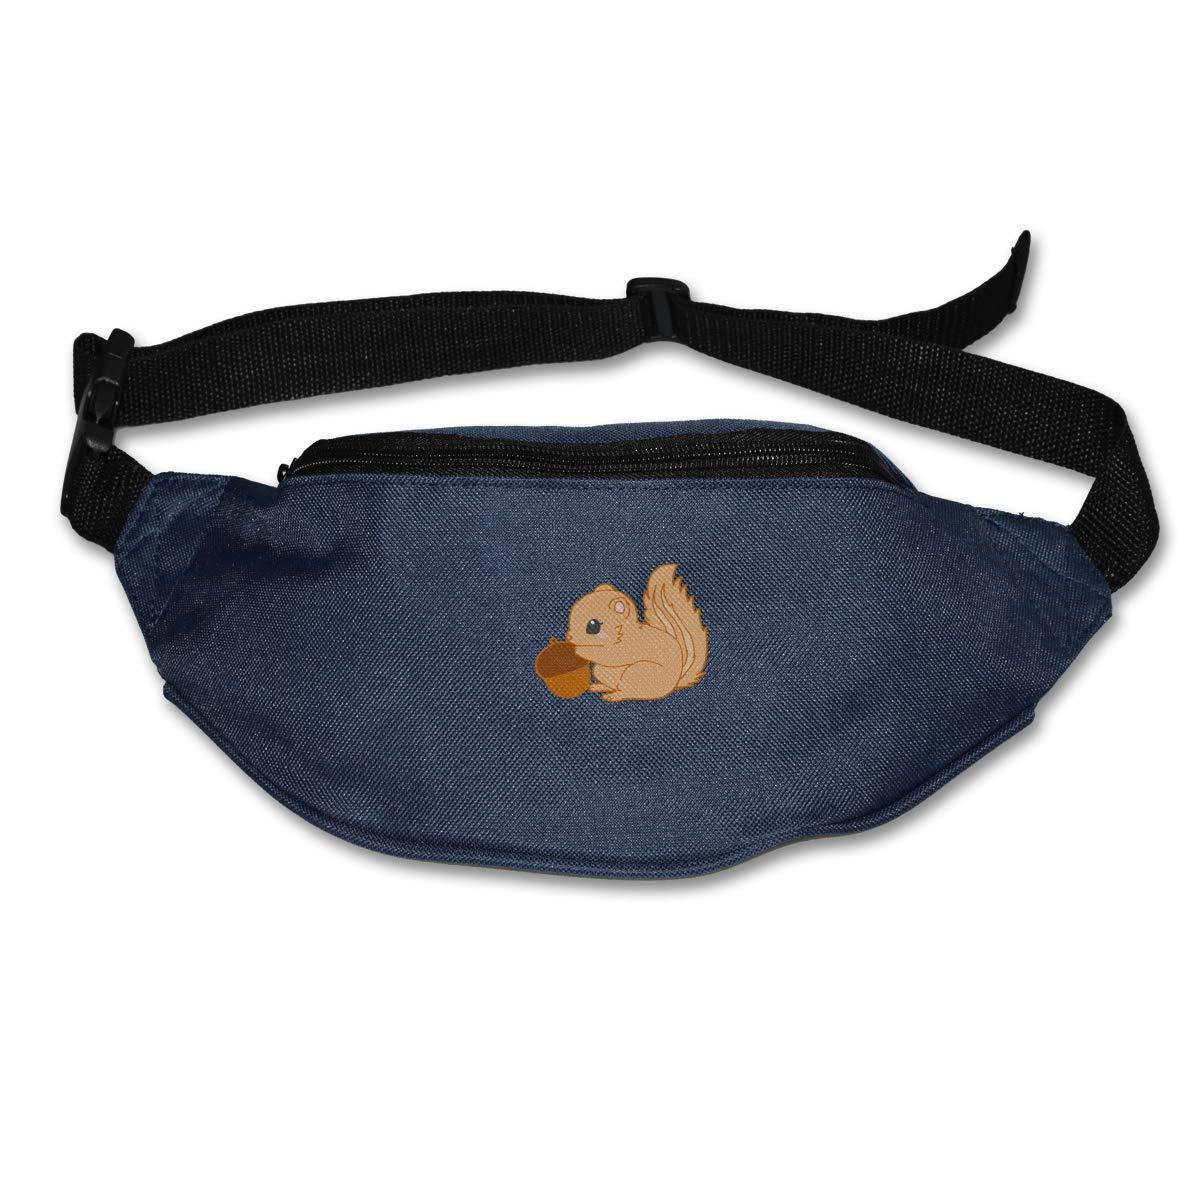 Squirrel Loves Pine Nut Sport Waist Pack Fanny Pack Adjustable For Travel